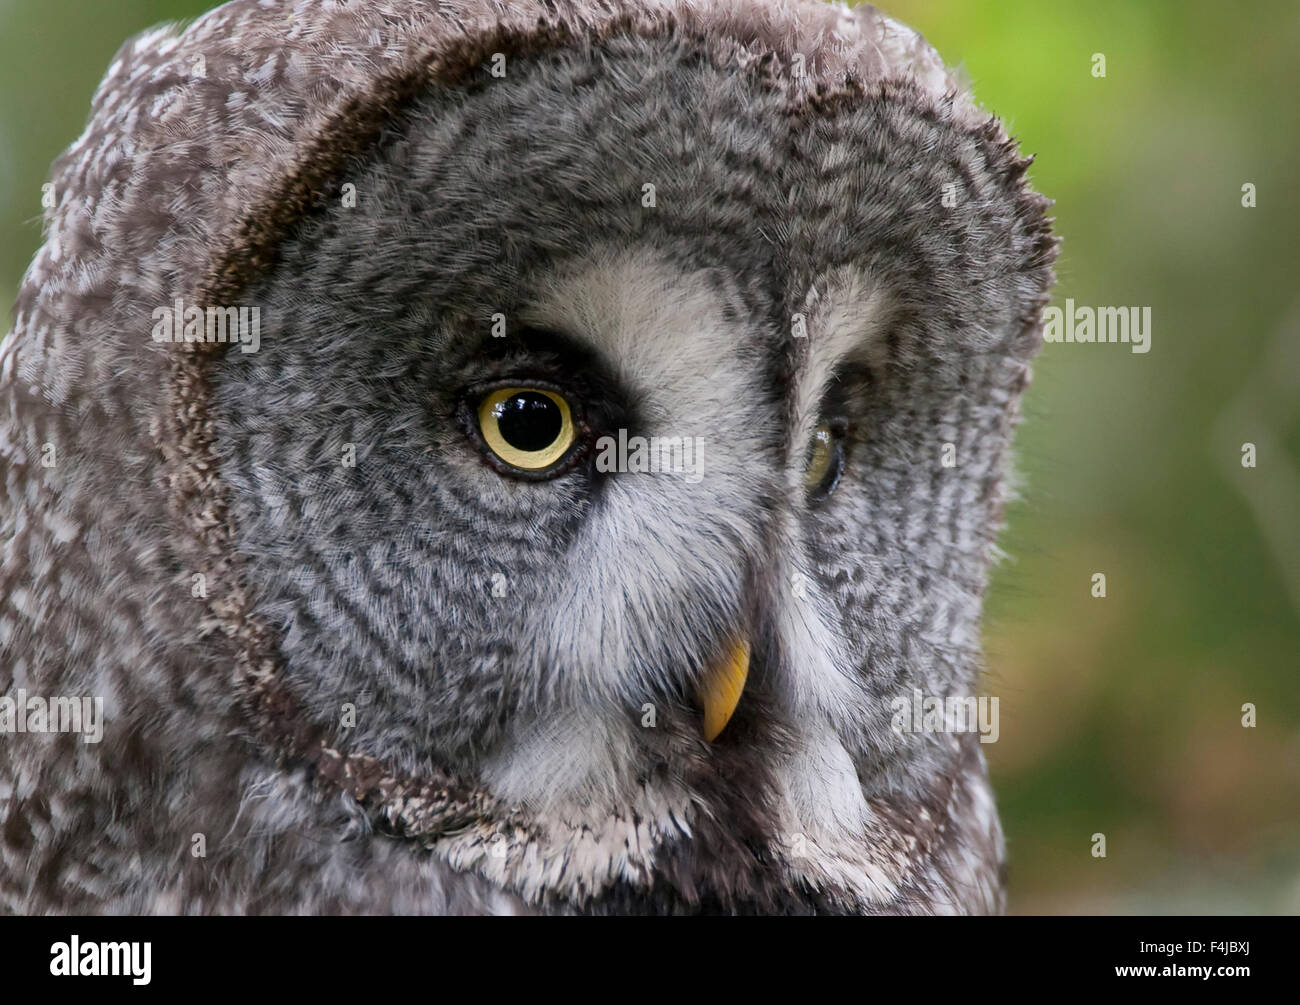 Great grey owl (Strix nebulosa) head portrait, Bergslagen, Sweden, June 2009 - Stock Image